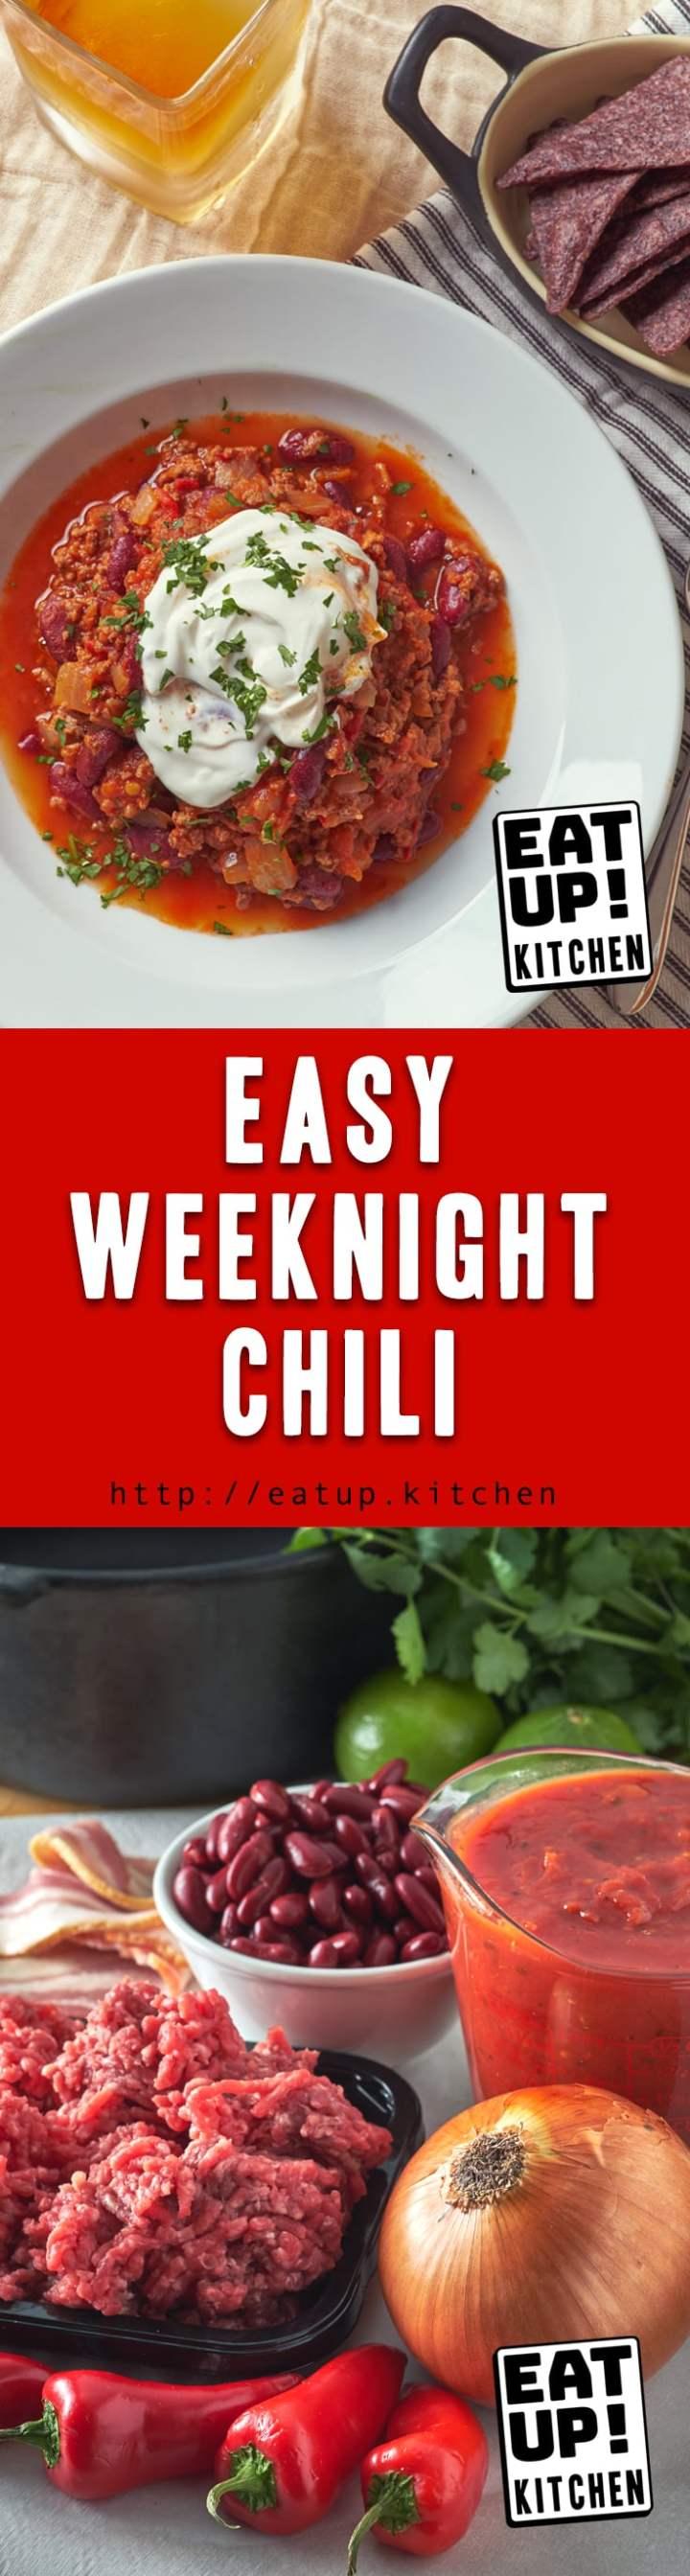 Easy Weeknight Chili